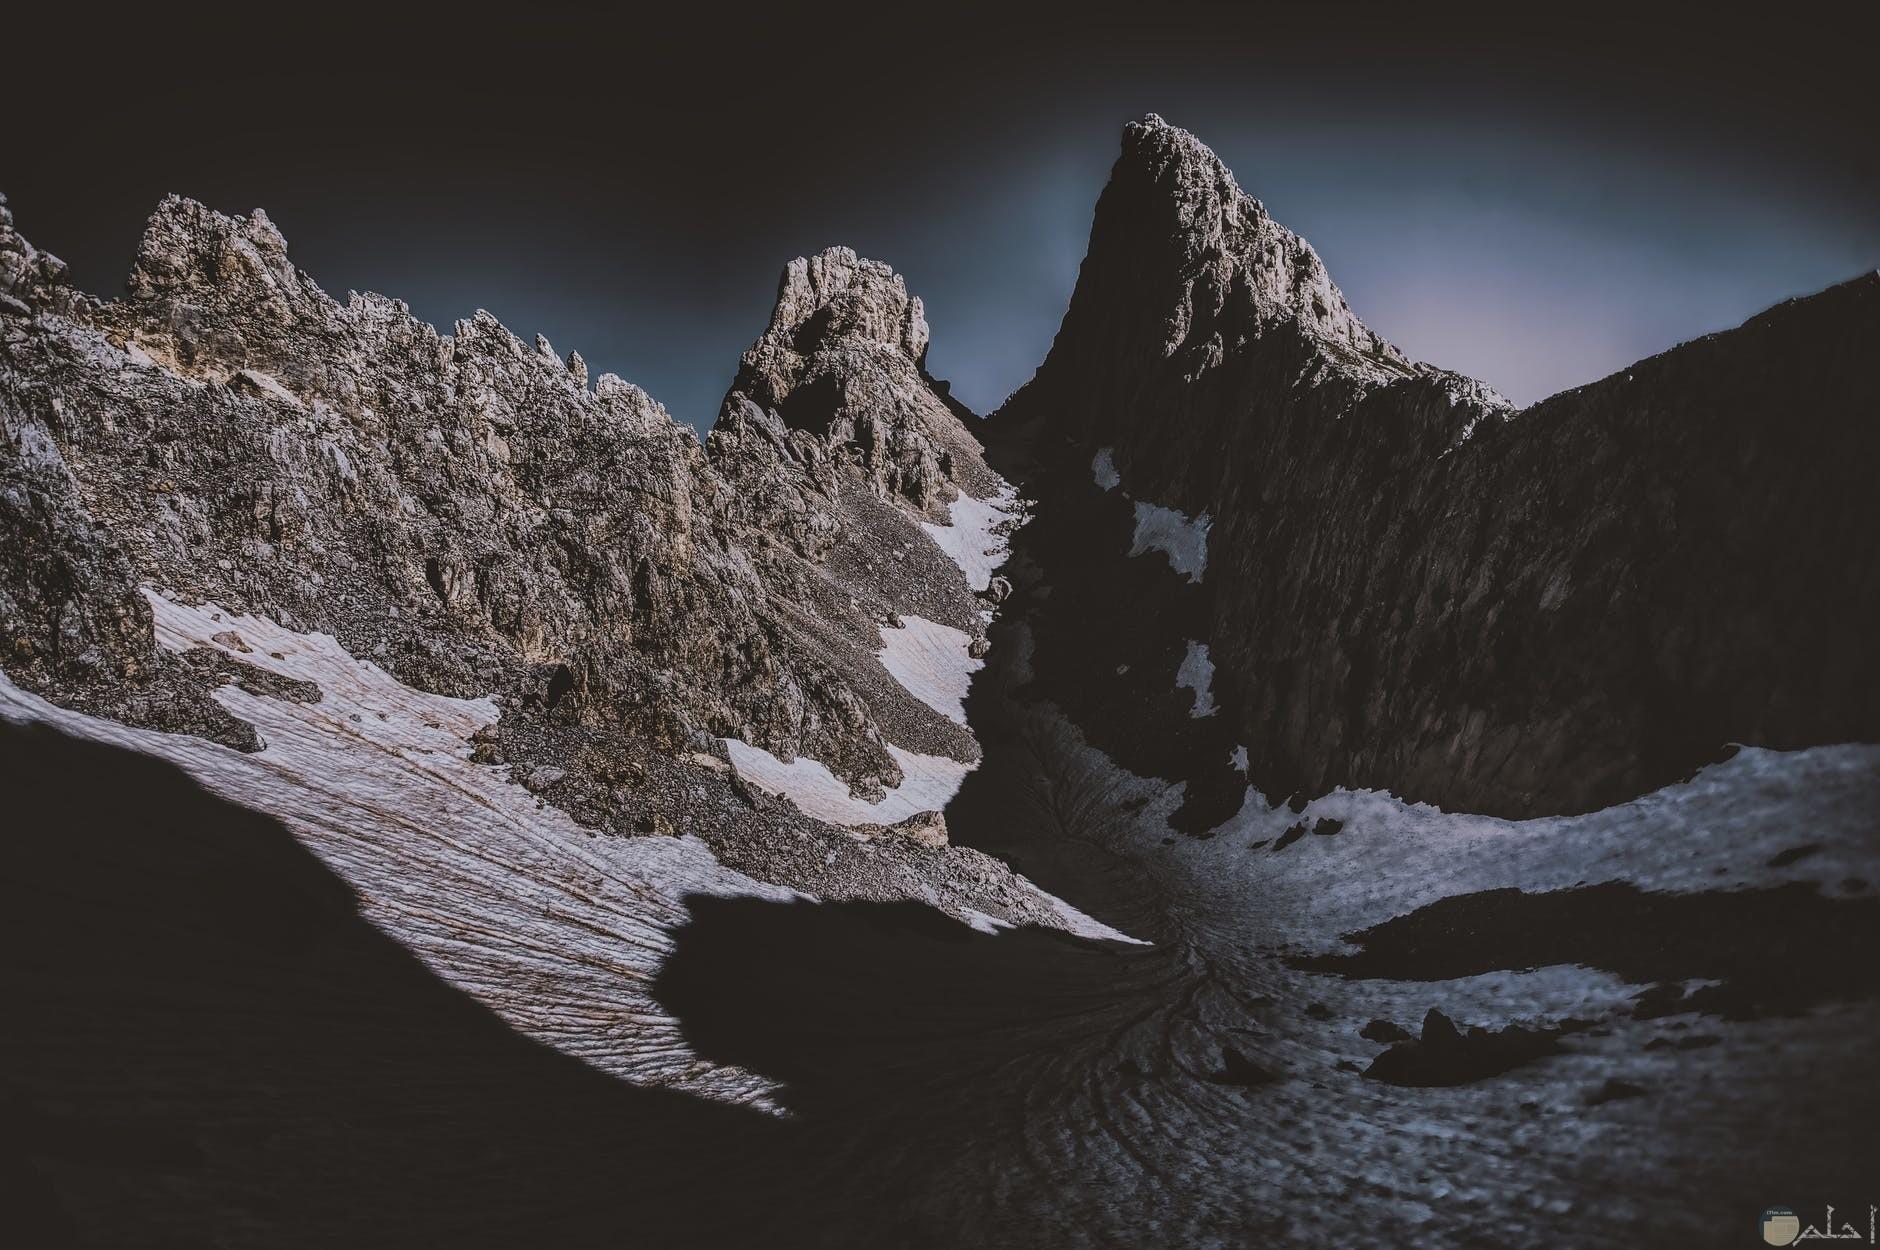 صور جبال عاليه وسماء سمراء